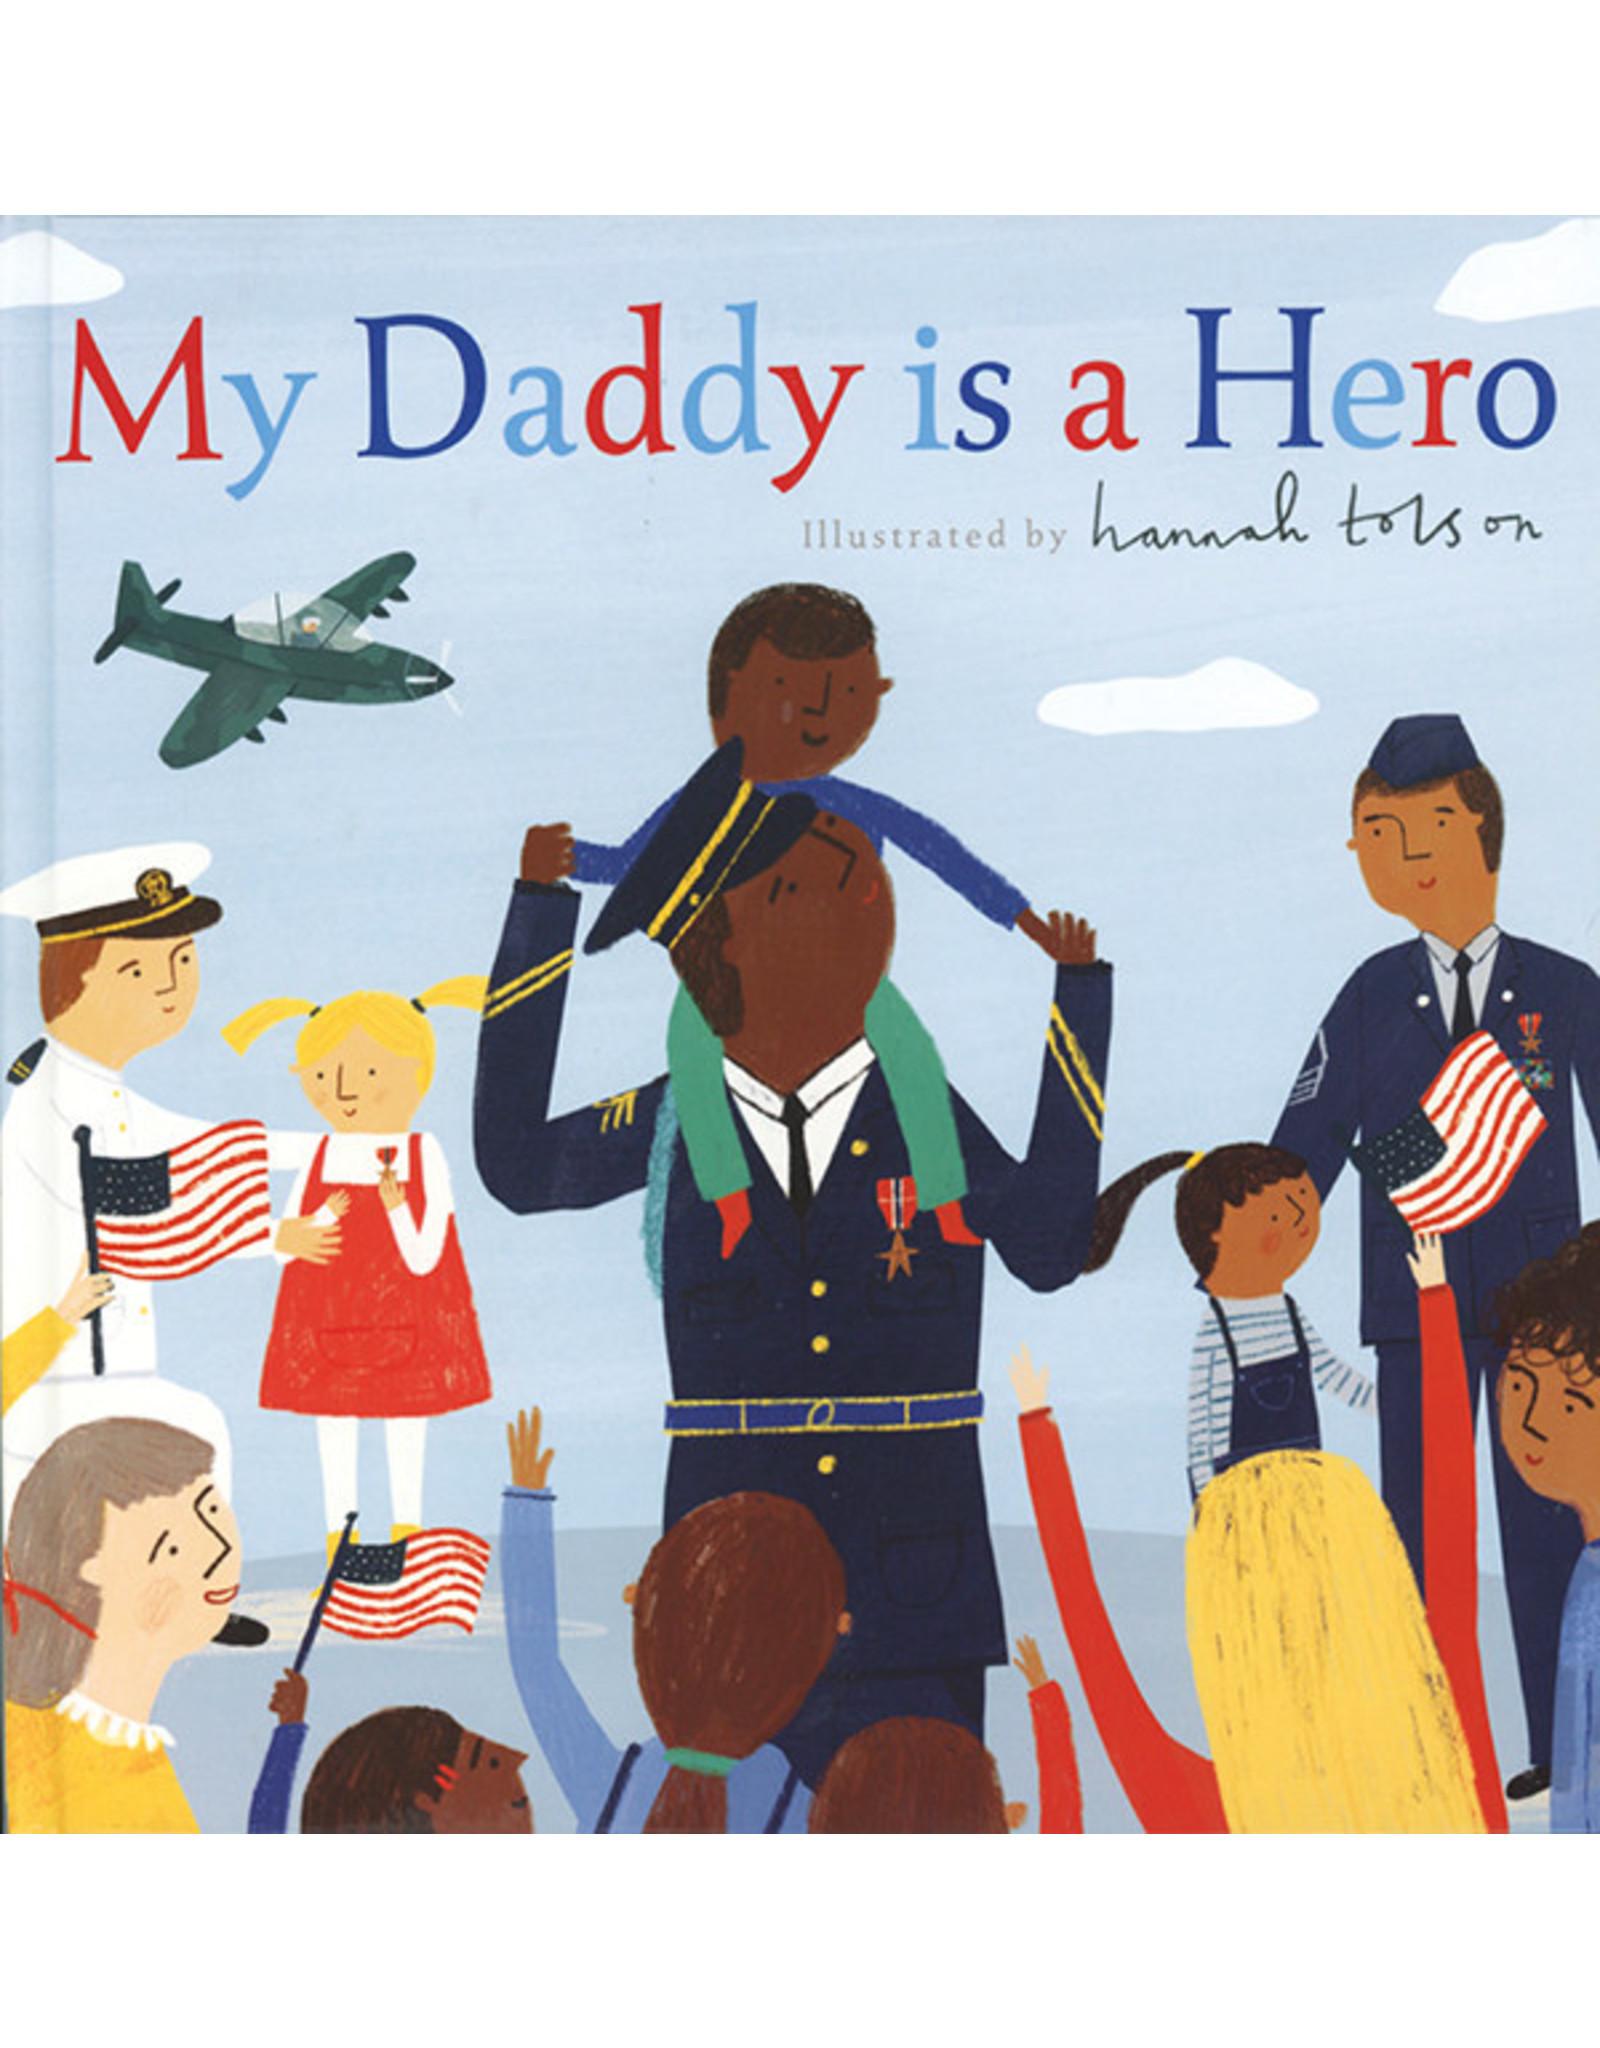 Usborne & Kane Miller Books My Daddy is a Hero